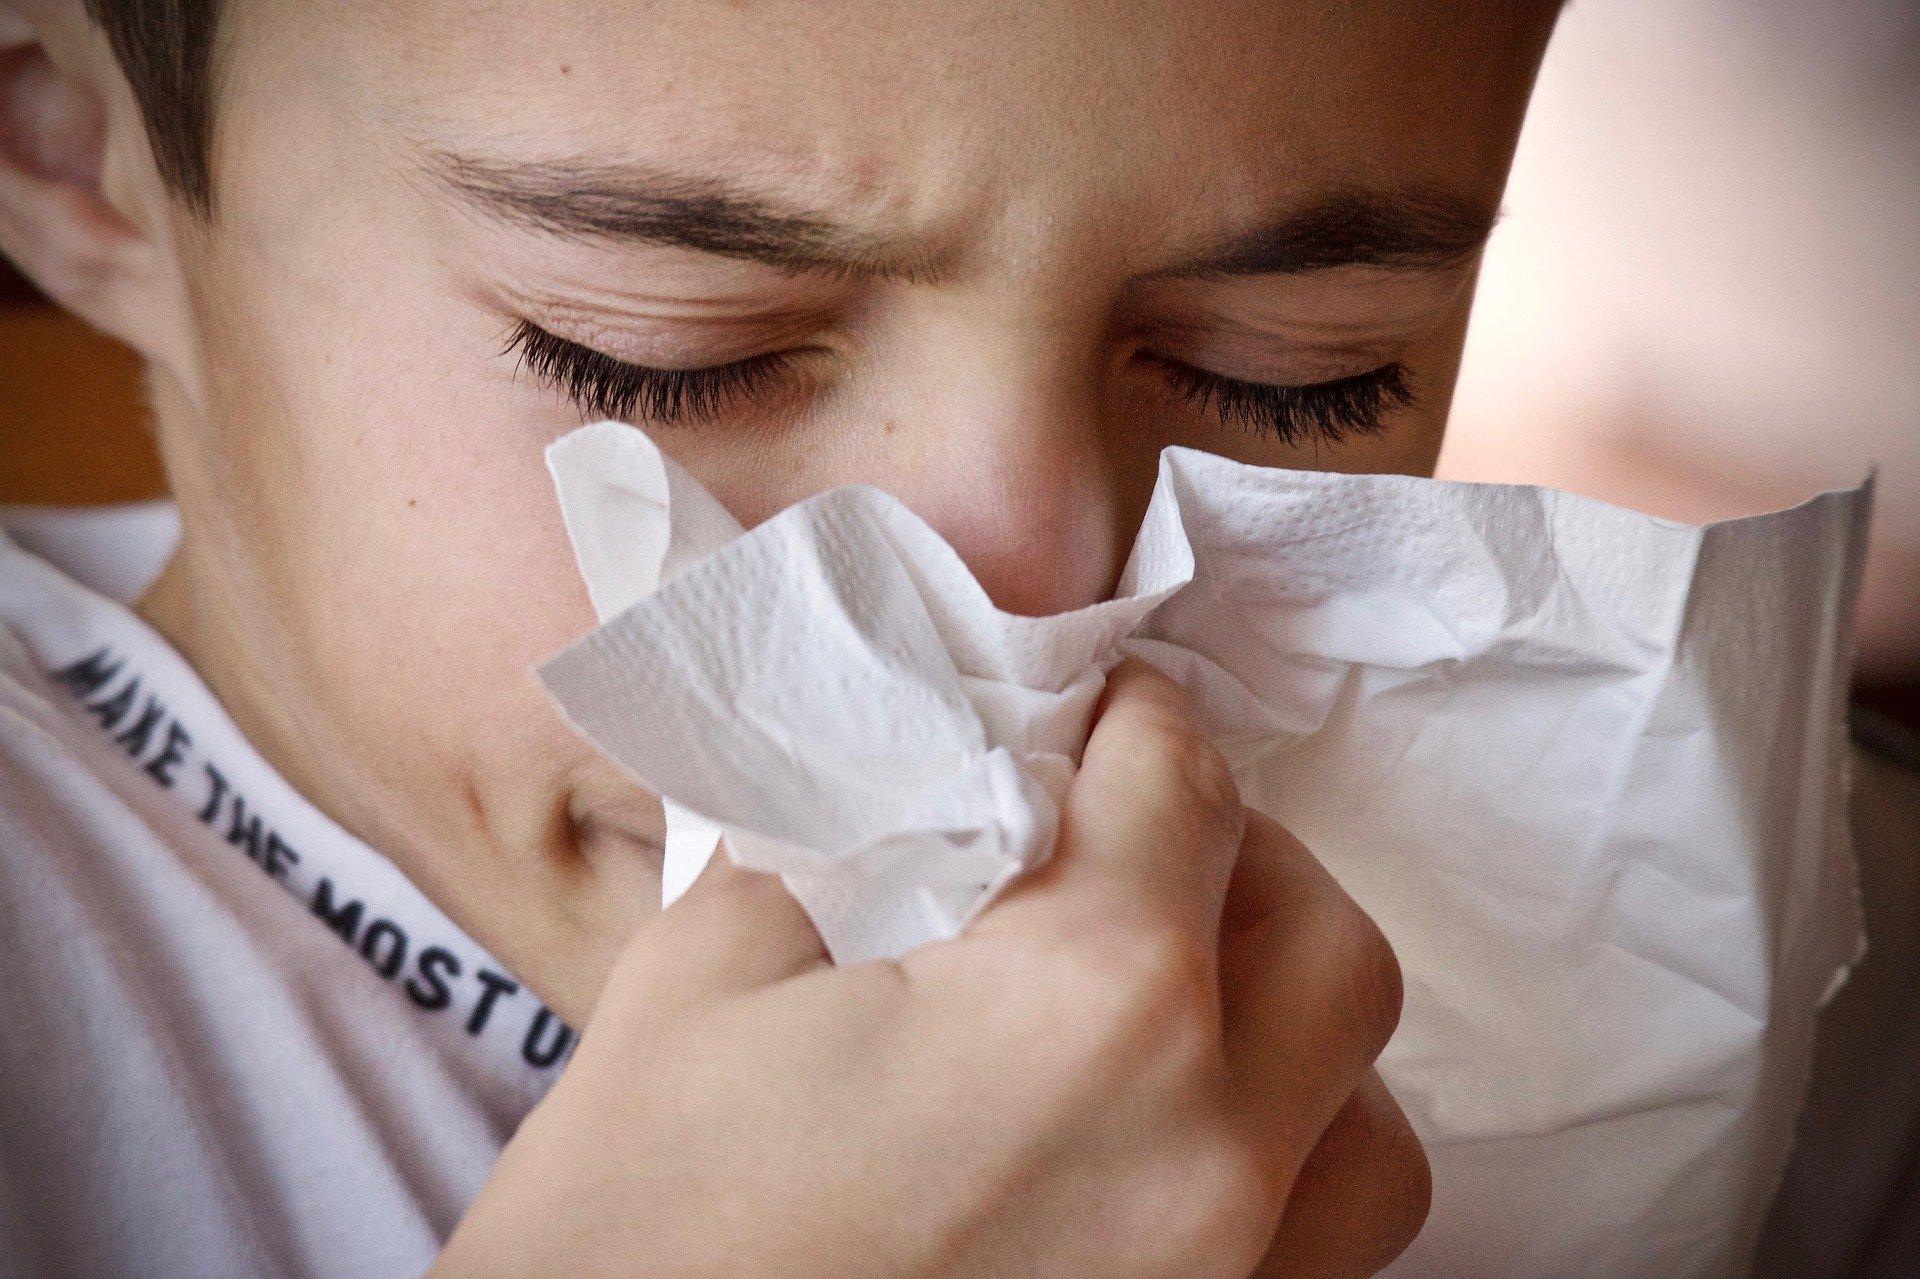 Schone lucht veroorzaakt minder hooikoortsklachten